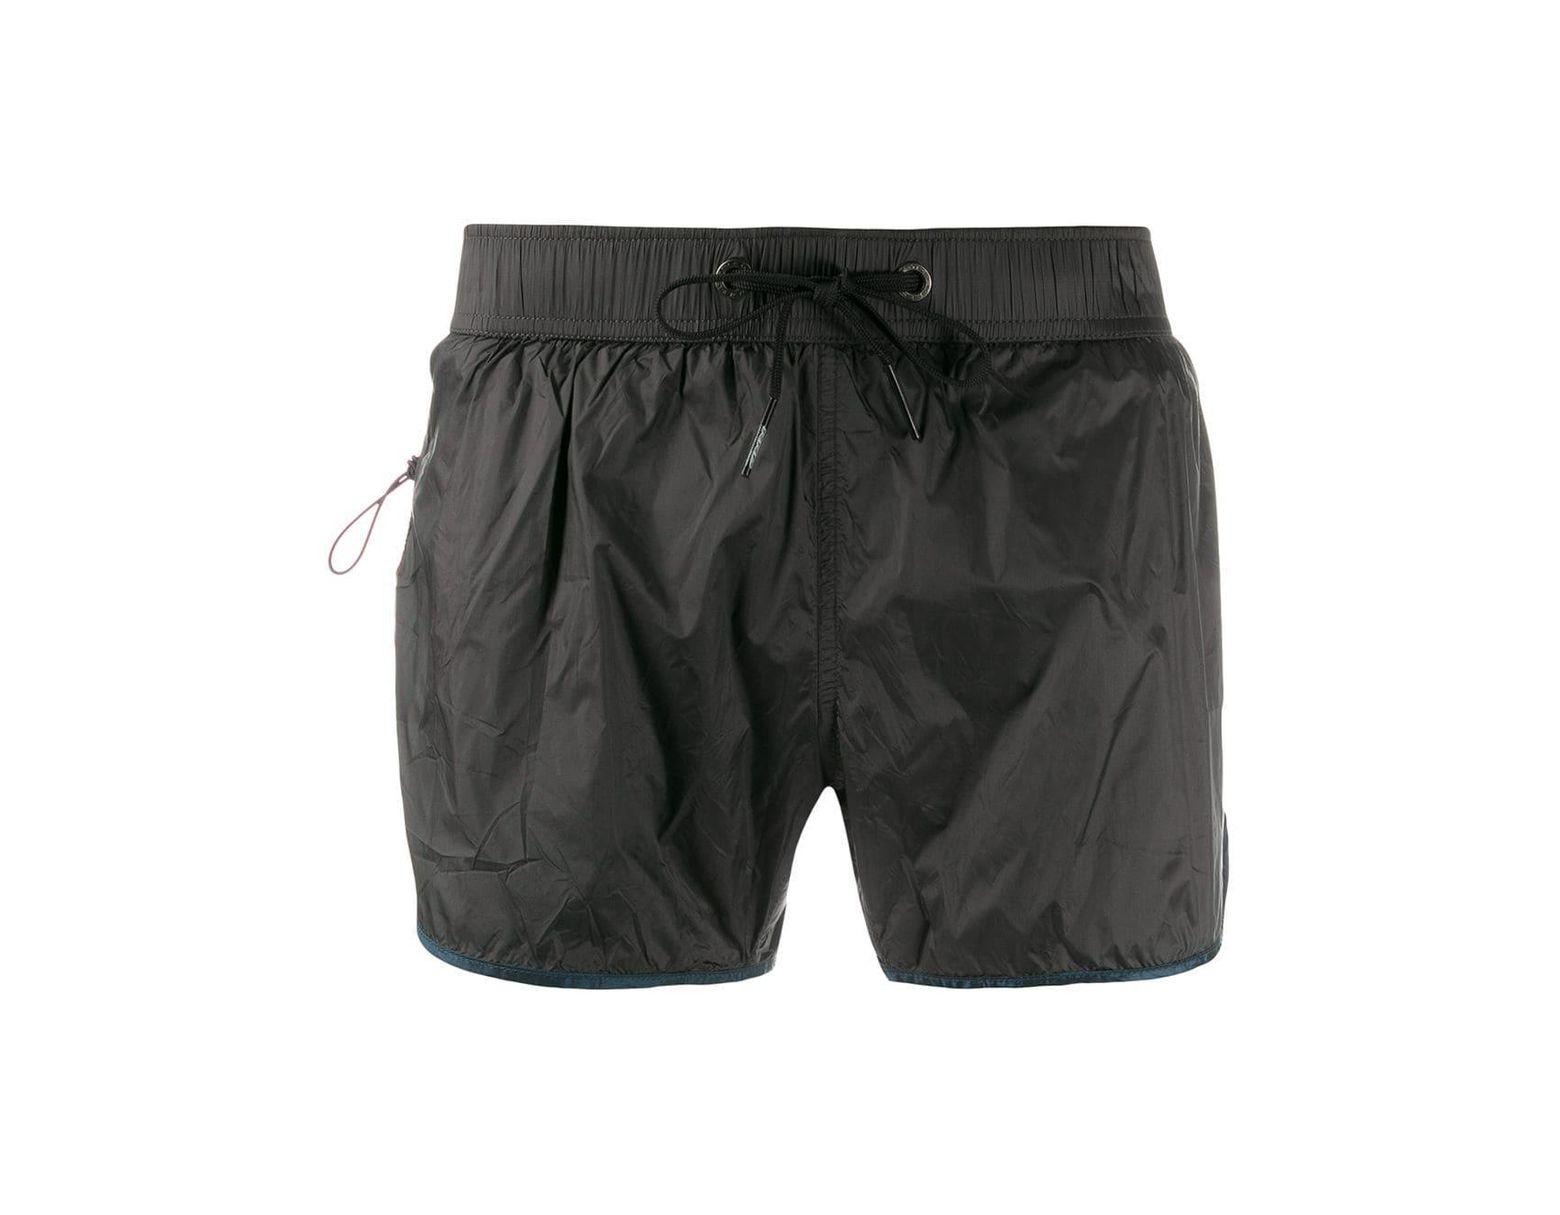 53d58874 Men's Gray Elasticated Swim Shorts